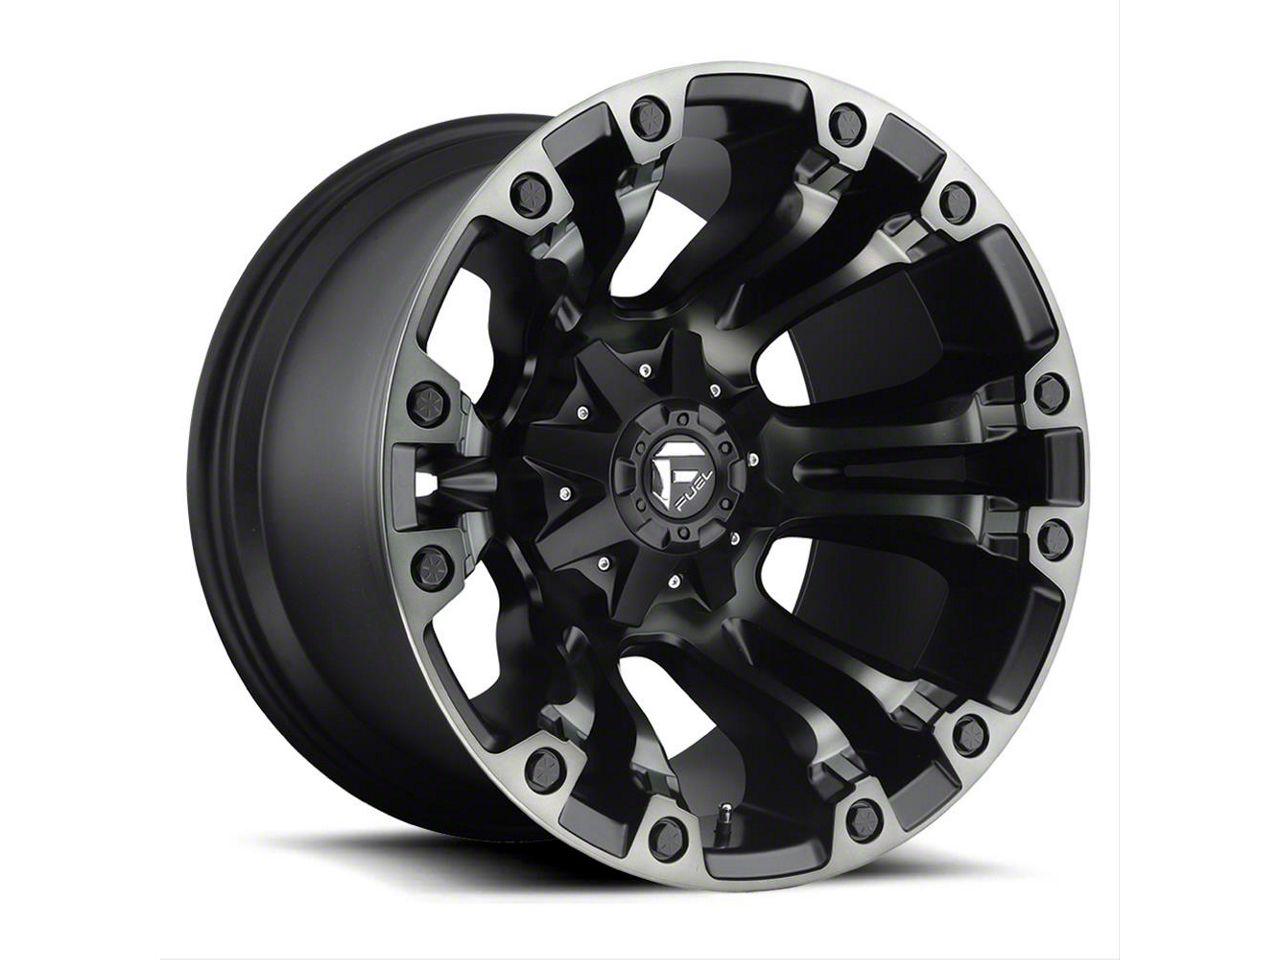 Fuel Wheels Vapor Matte Black Machined 6-Lug Wheel - 20x12 (99-18 Silverado 1500)